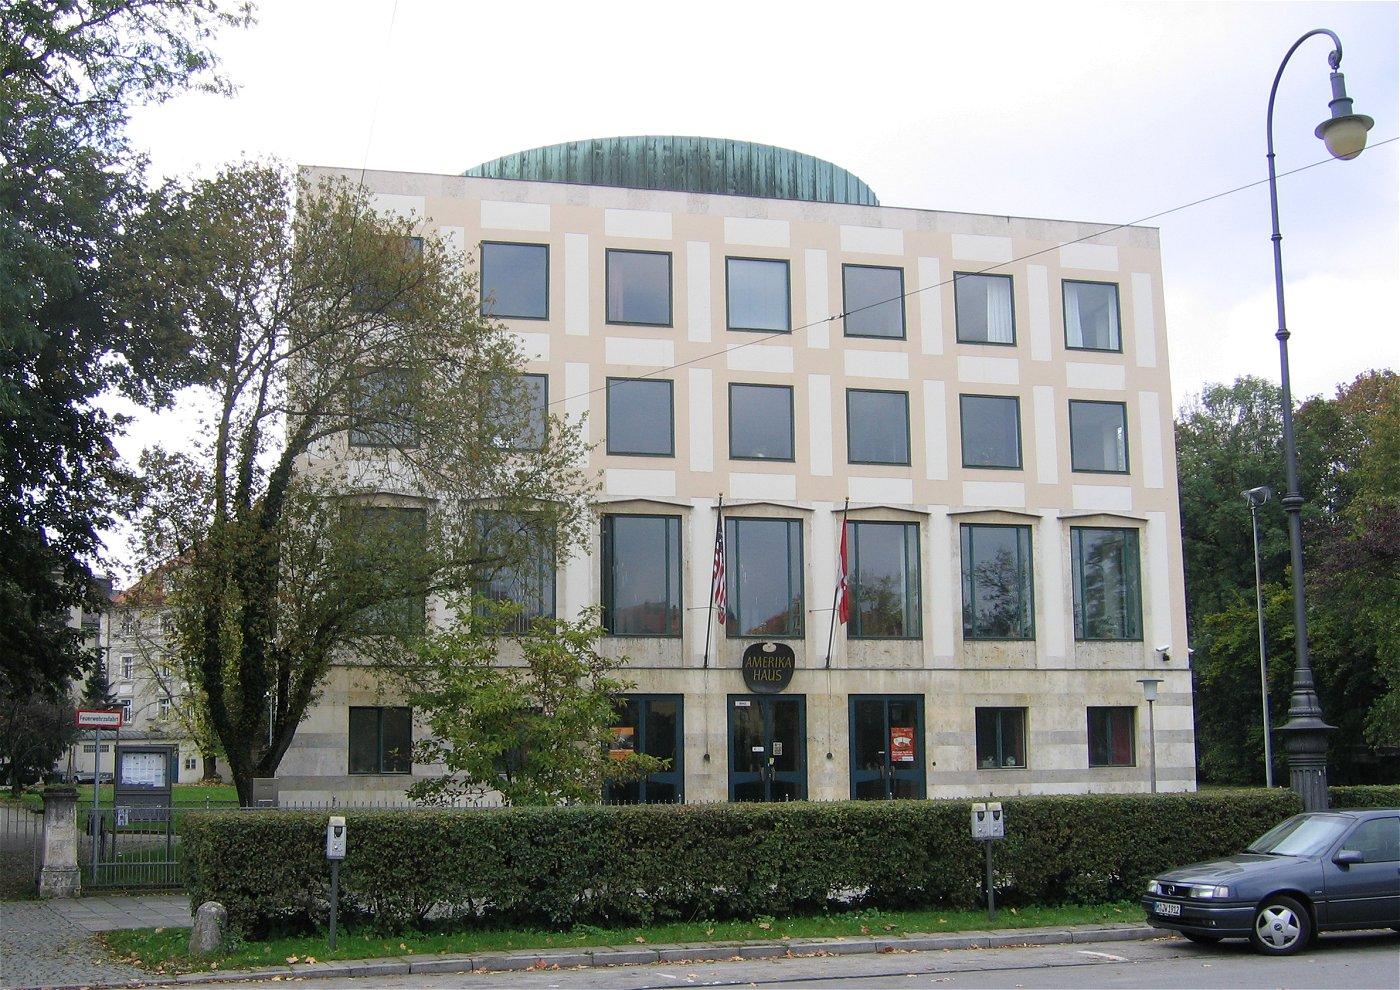 Munich's Amerikahaus